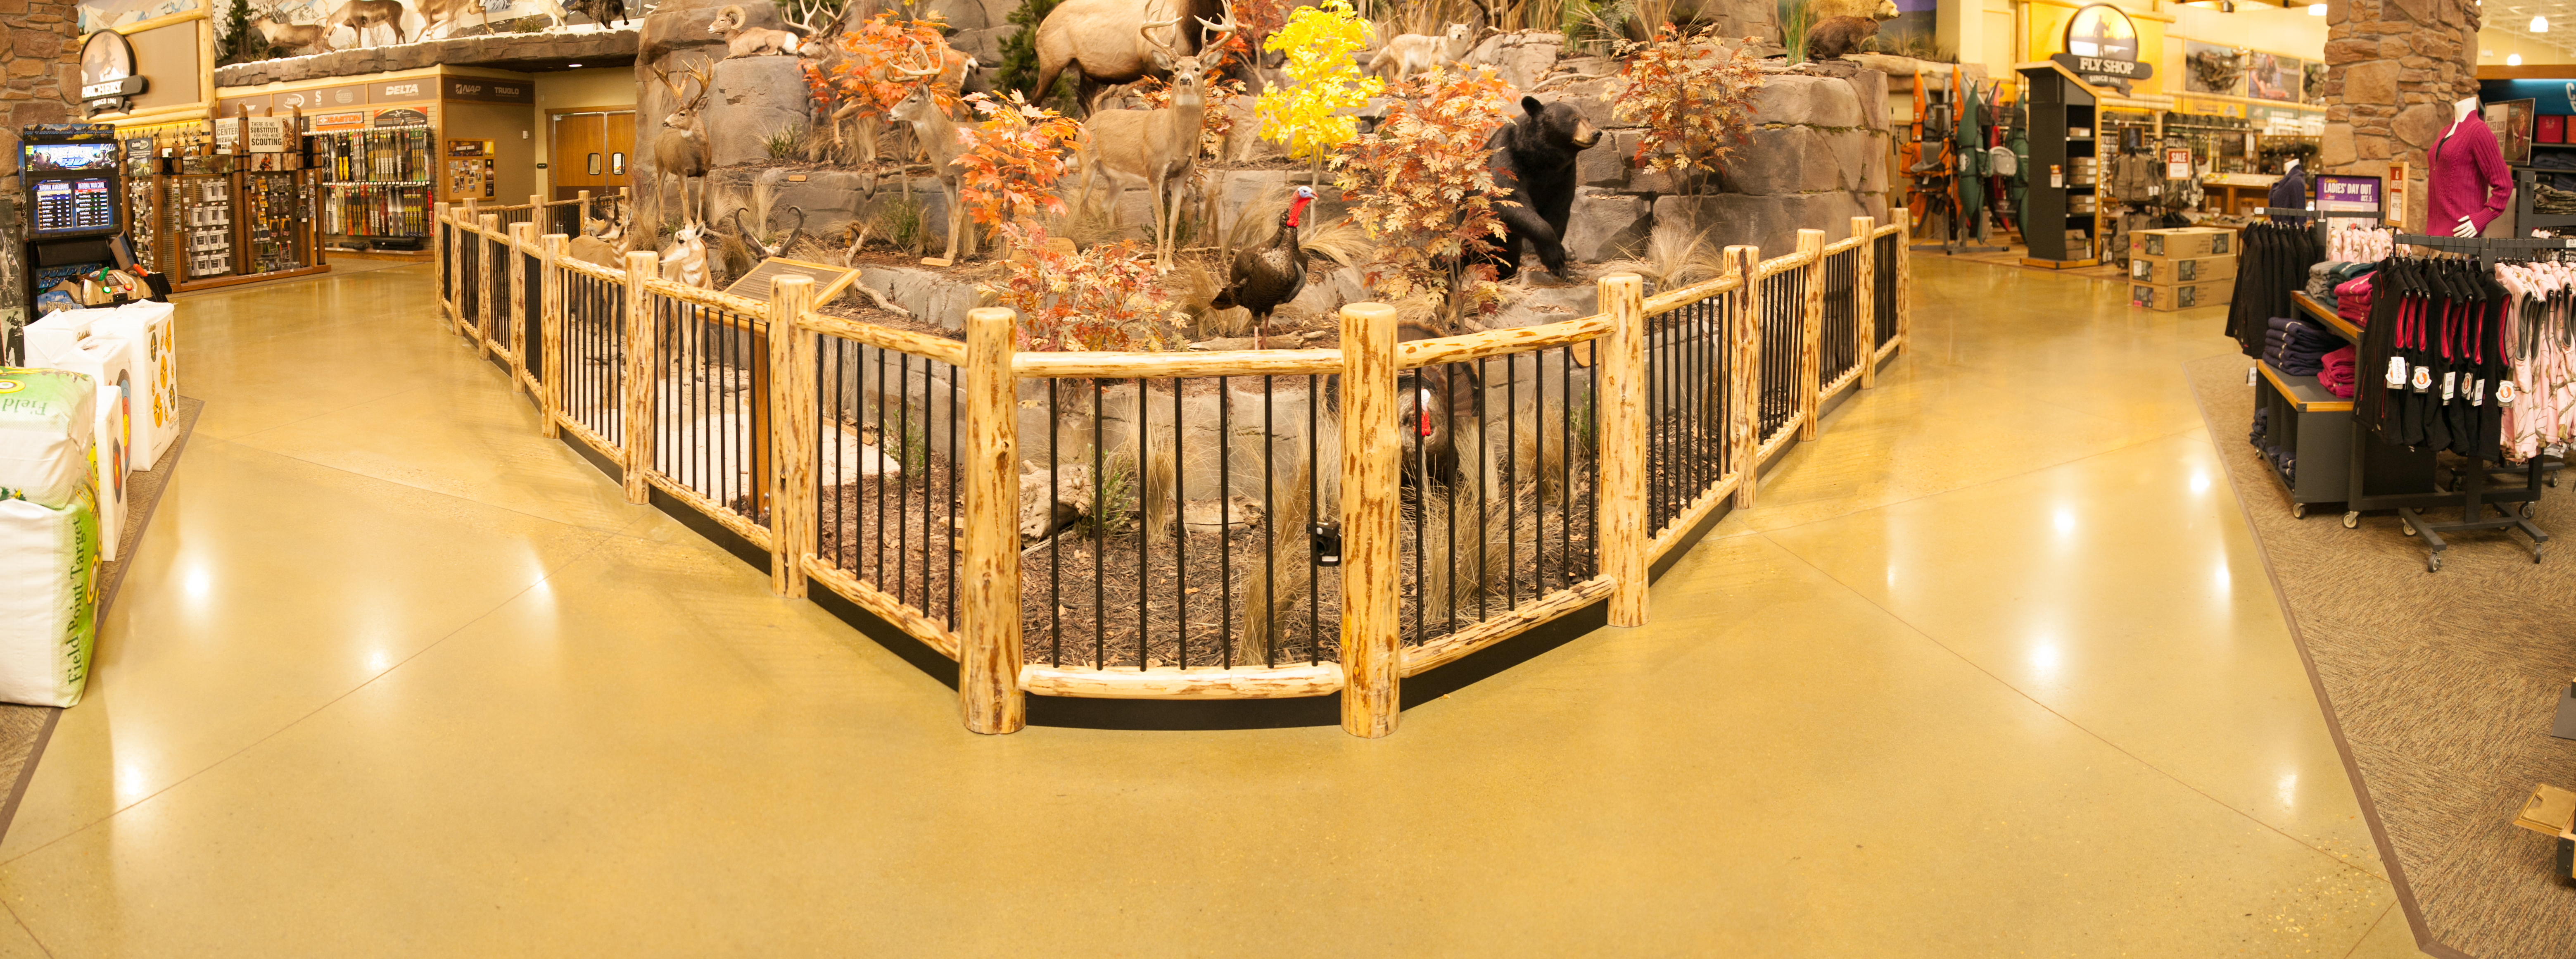 Cabela's Polished Concrete Entryway